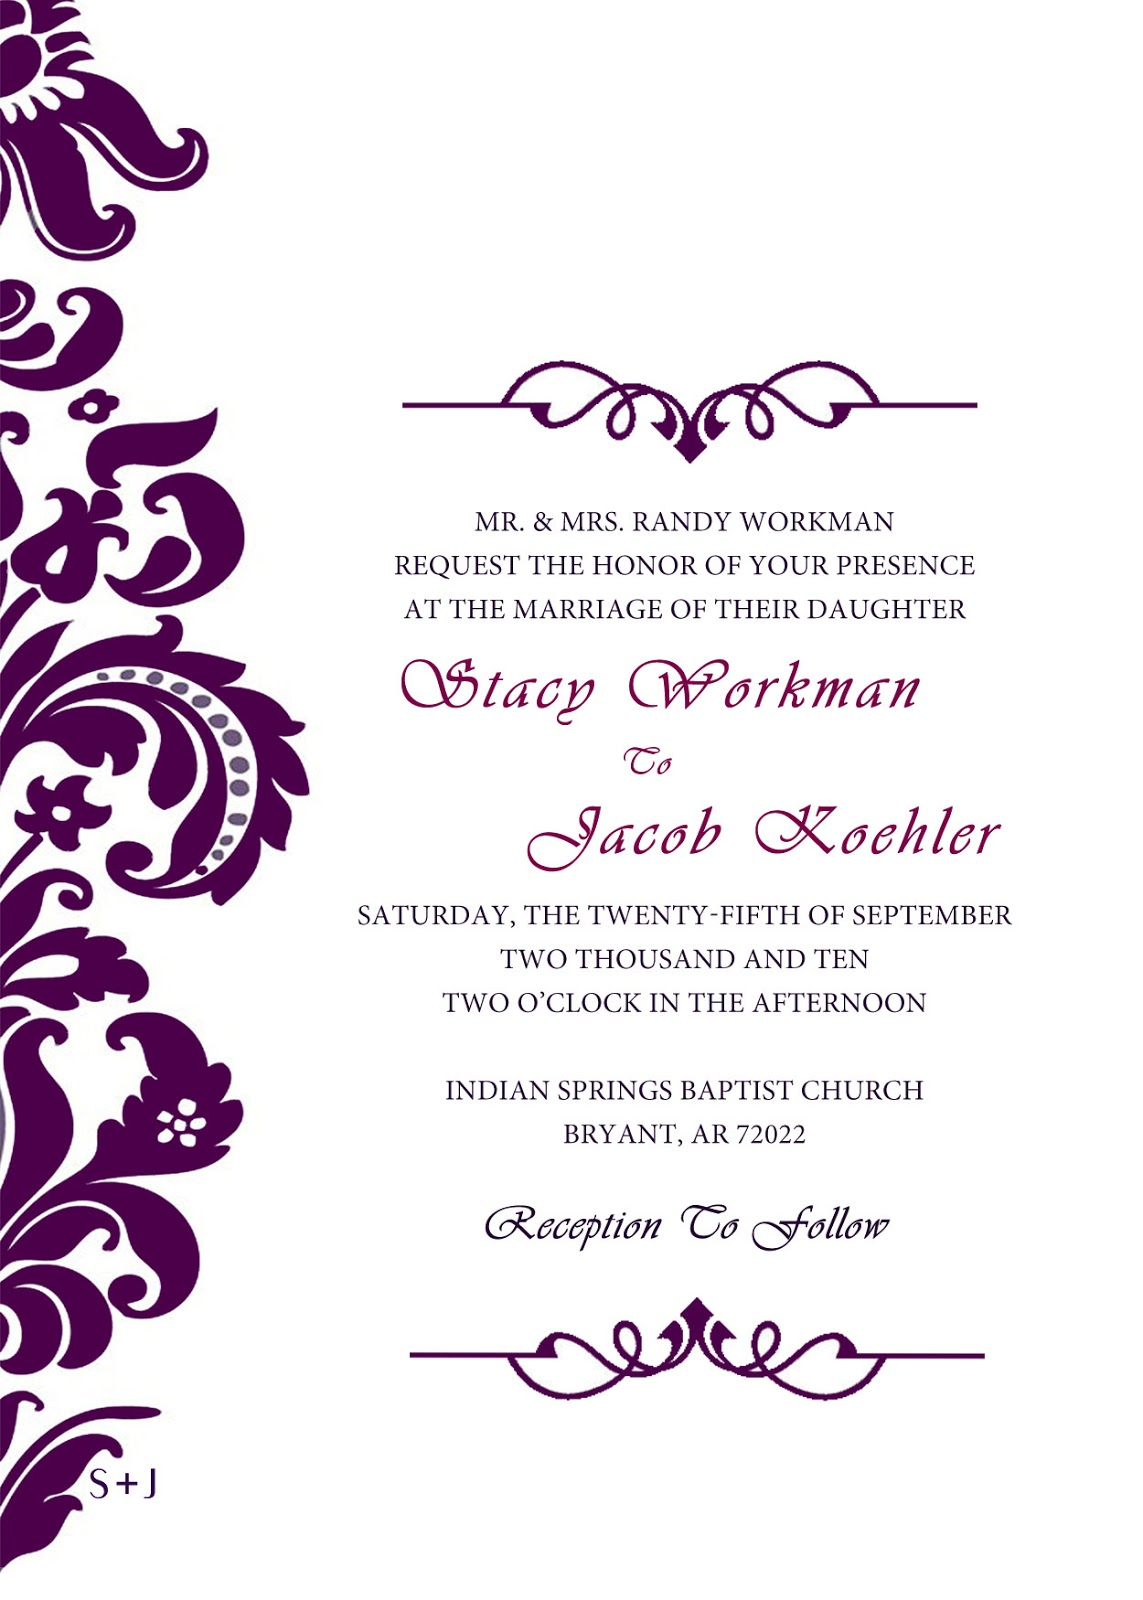 border patterns for wedding invitations wedding invitation design templates border element for valentine